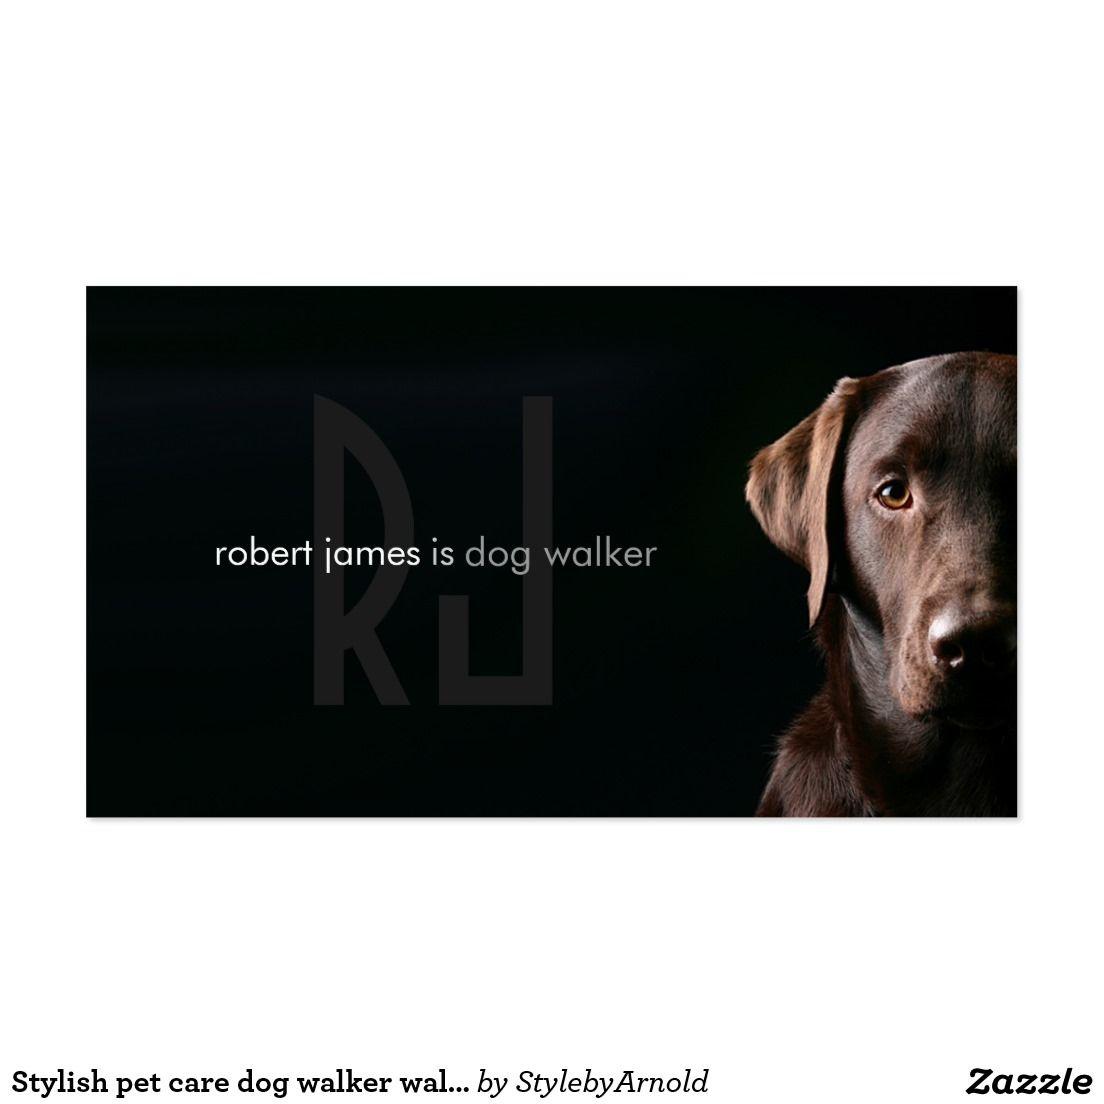 Stylish pet care dog walker walking business card | Pet care and Dog